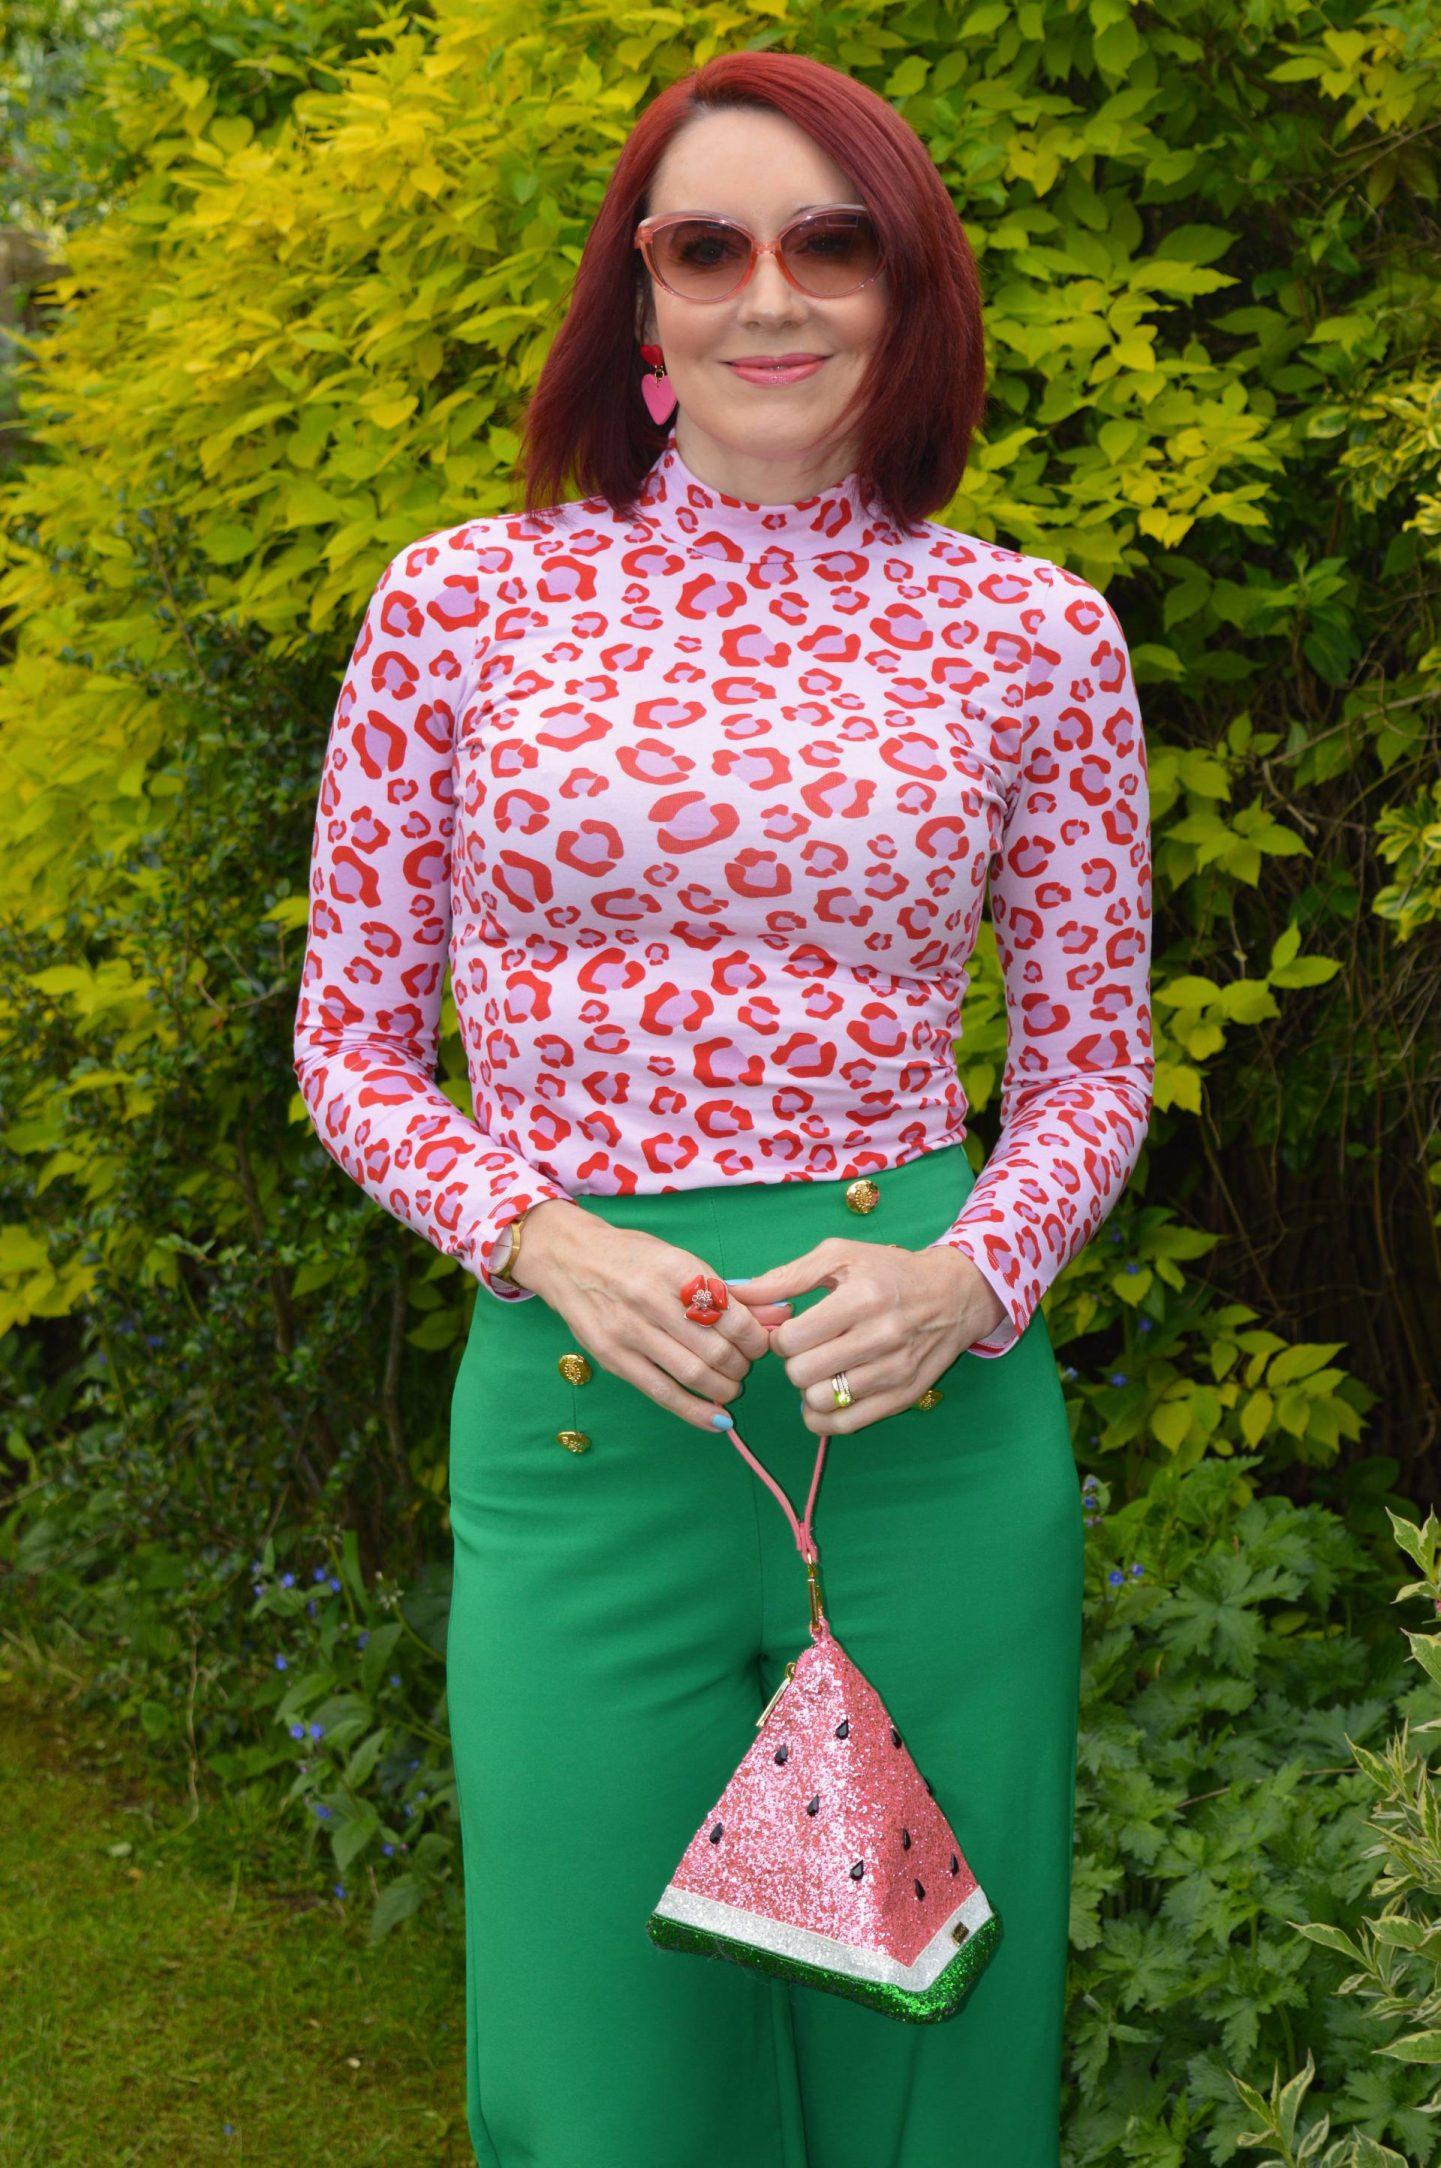 Saturday by Megan Ellaby Hazel pink  top, Skinny Dip glitter warermelon bag, Flounce emerald green trousers